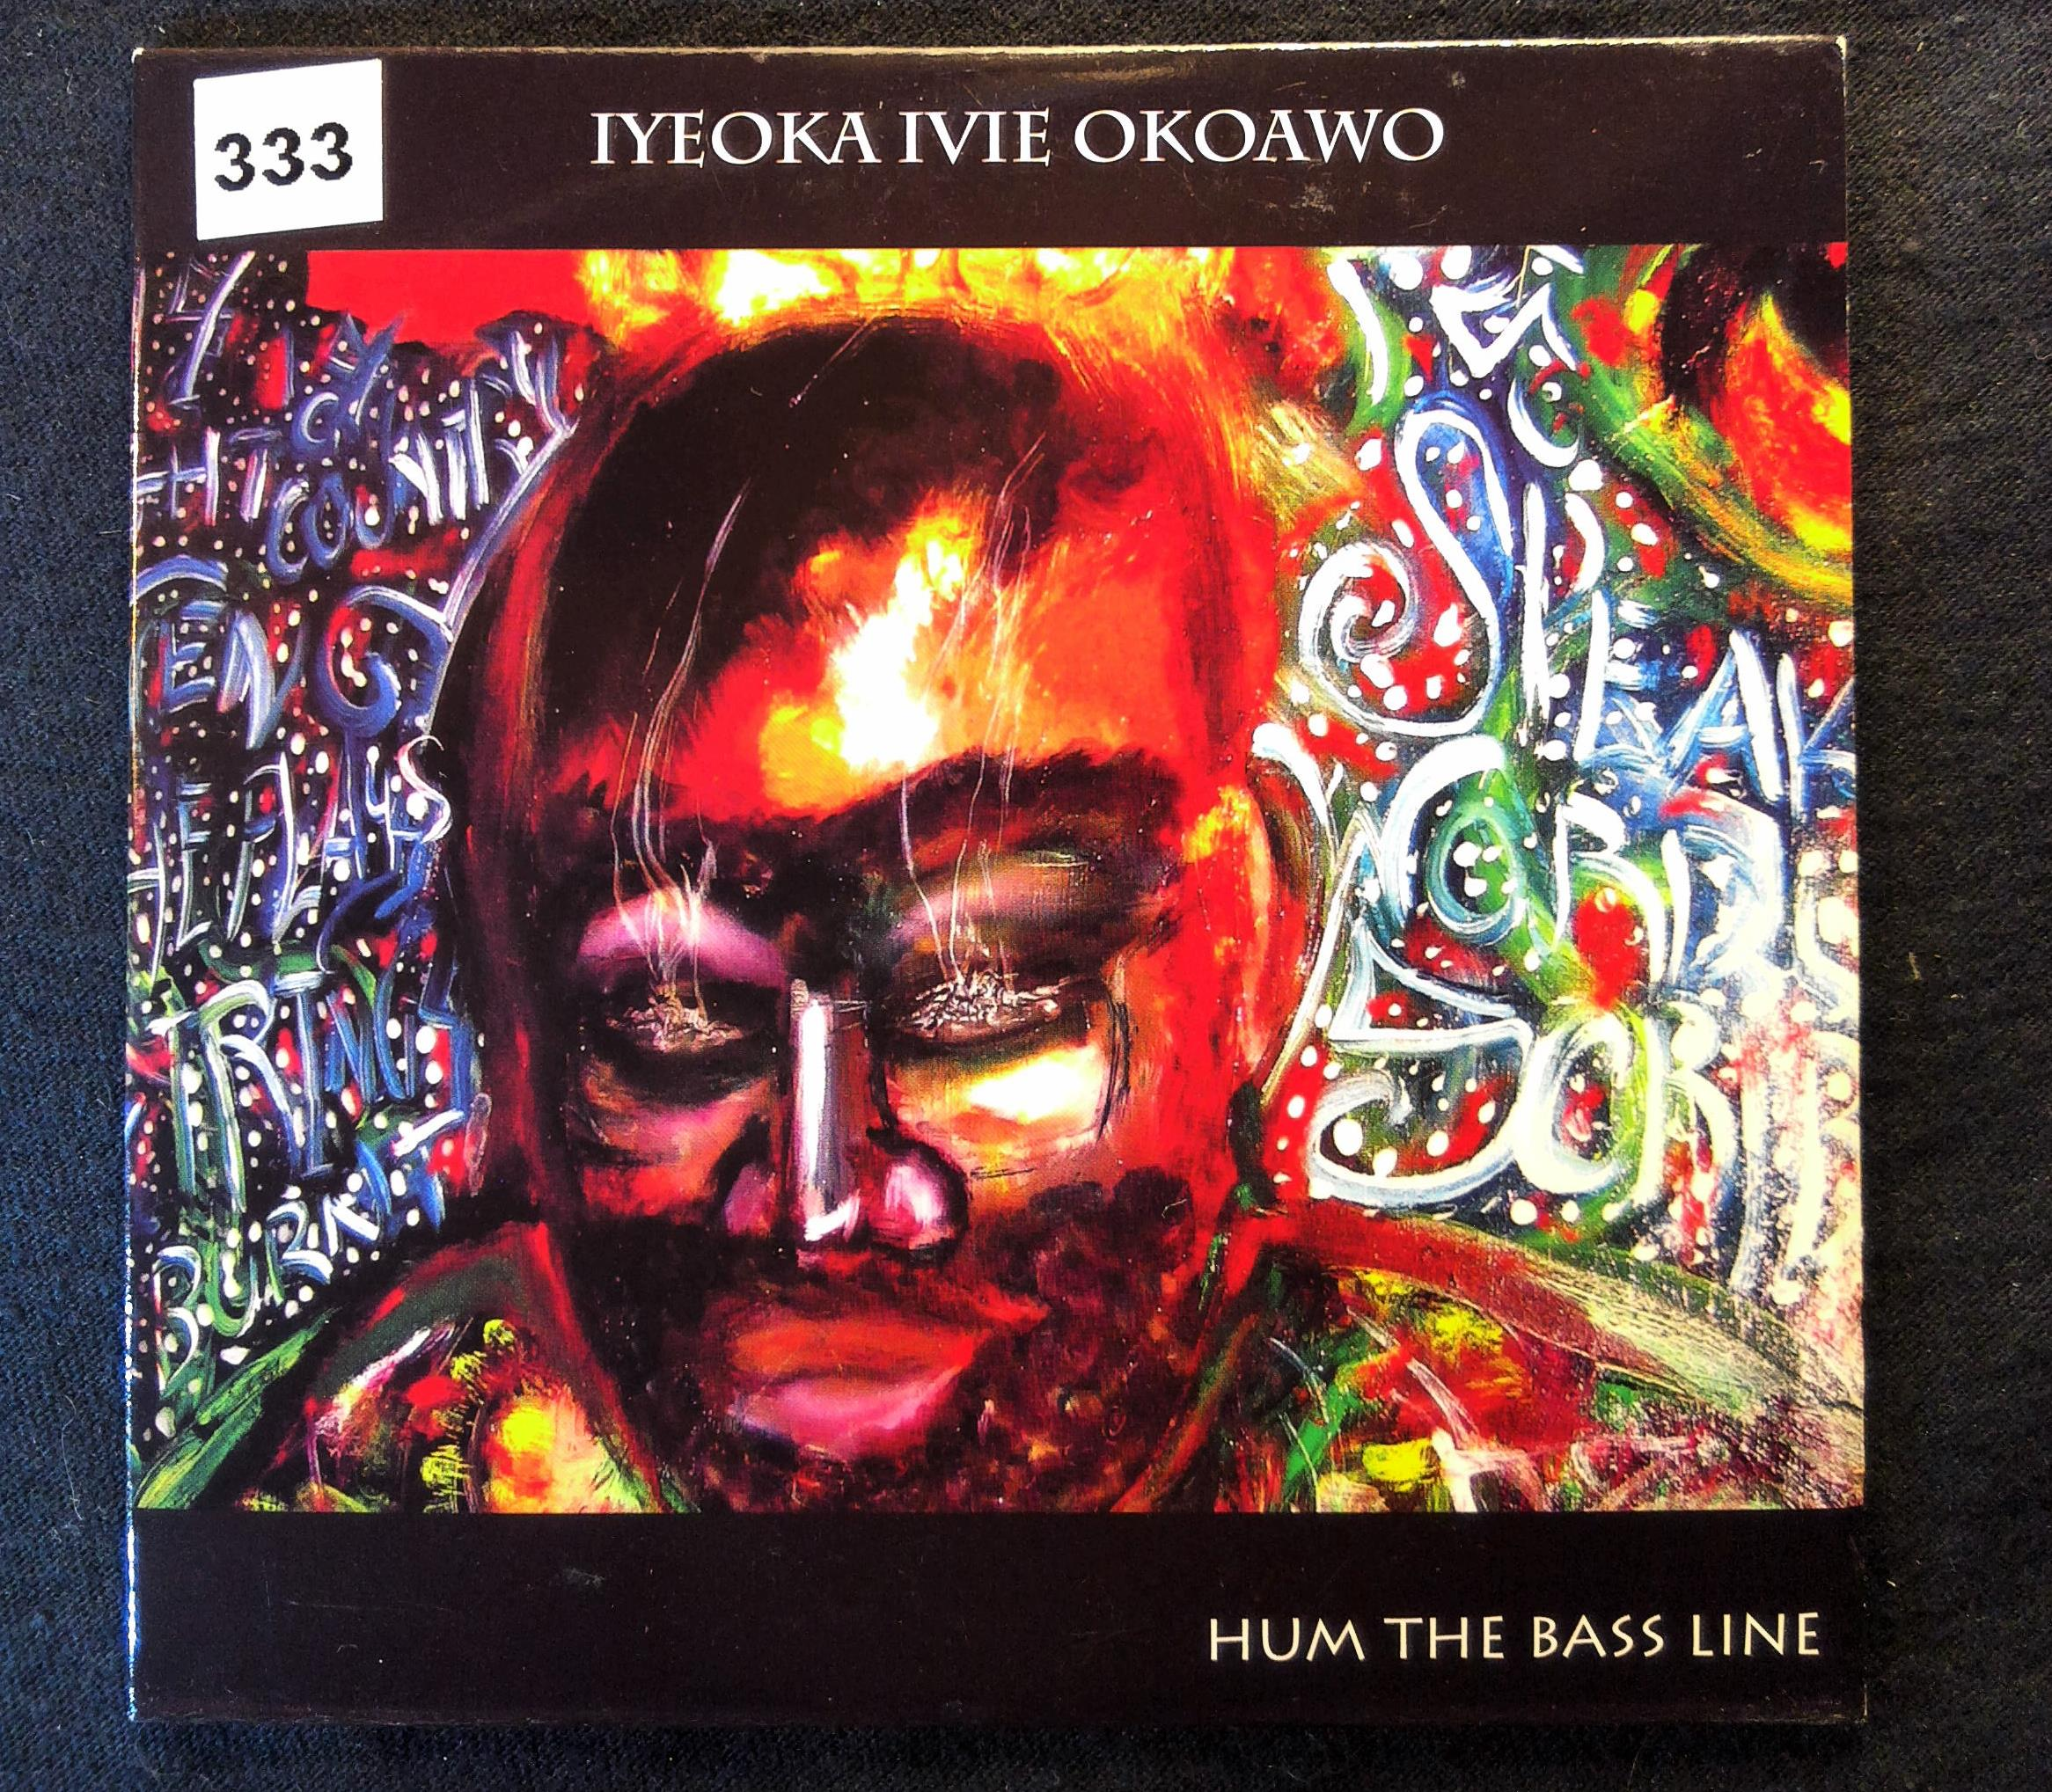 iyeoka hum the bassline album